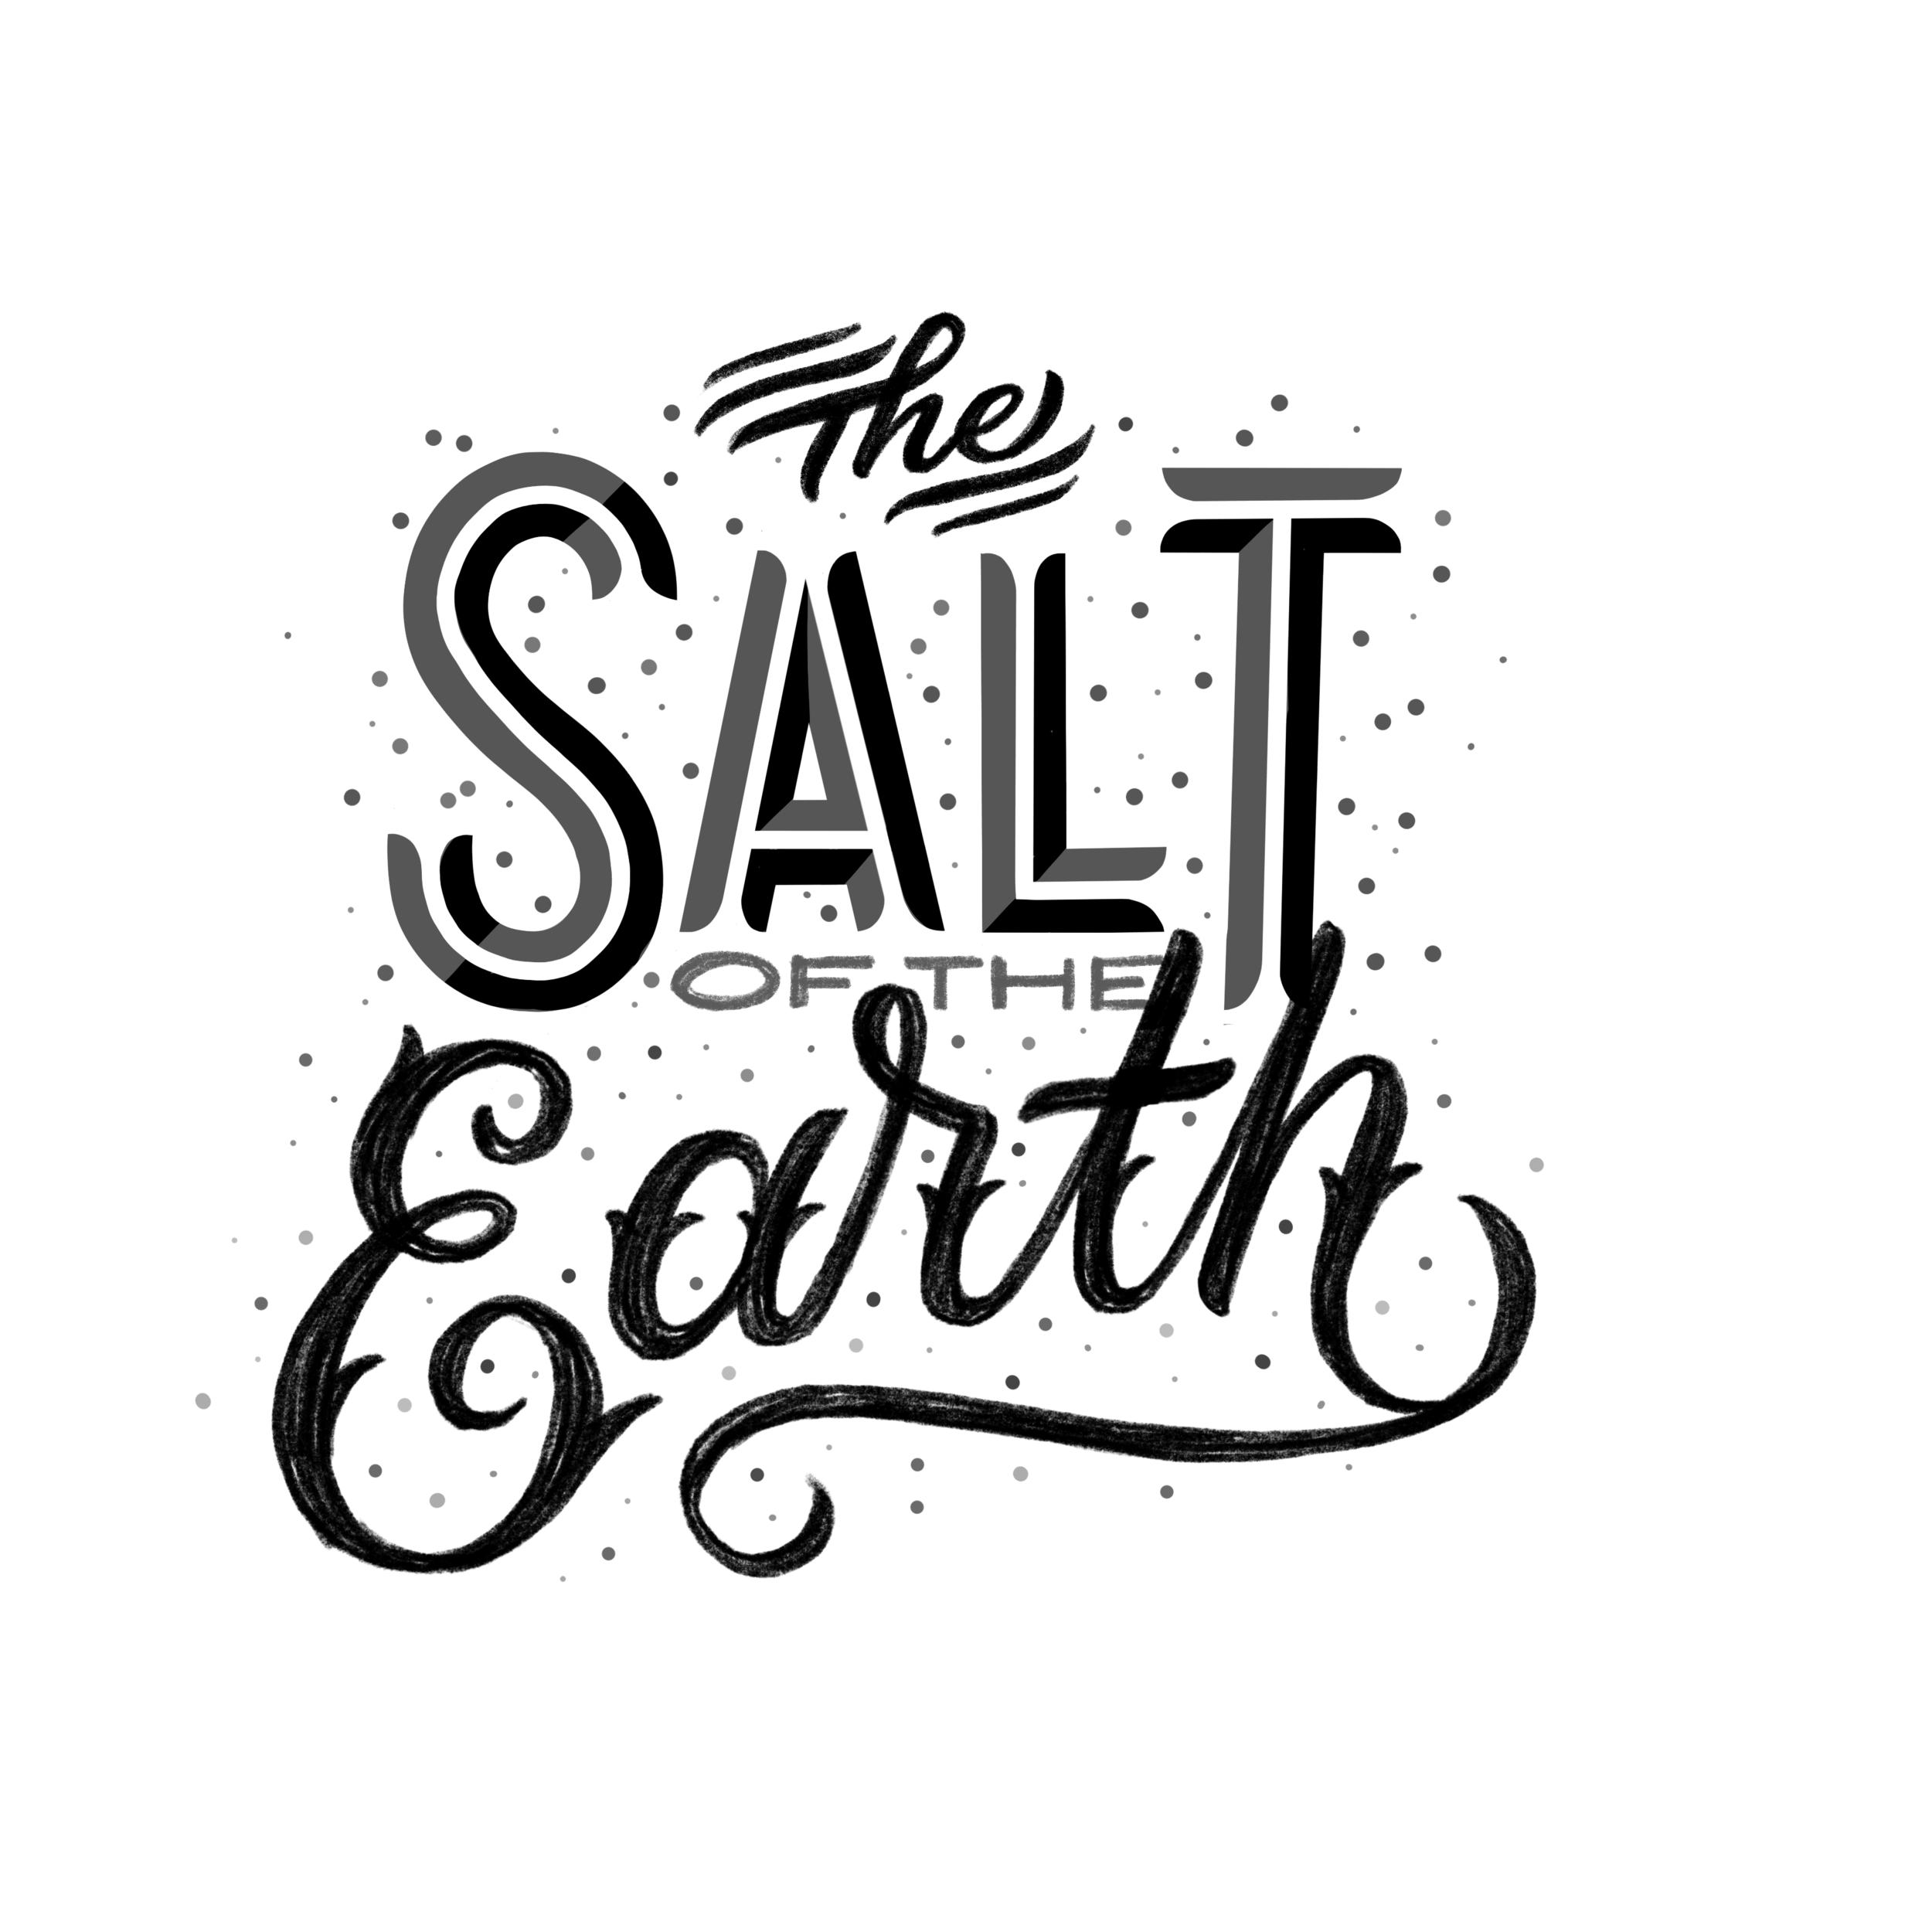 salt_of_he_earth copy.png